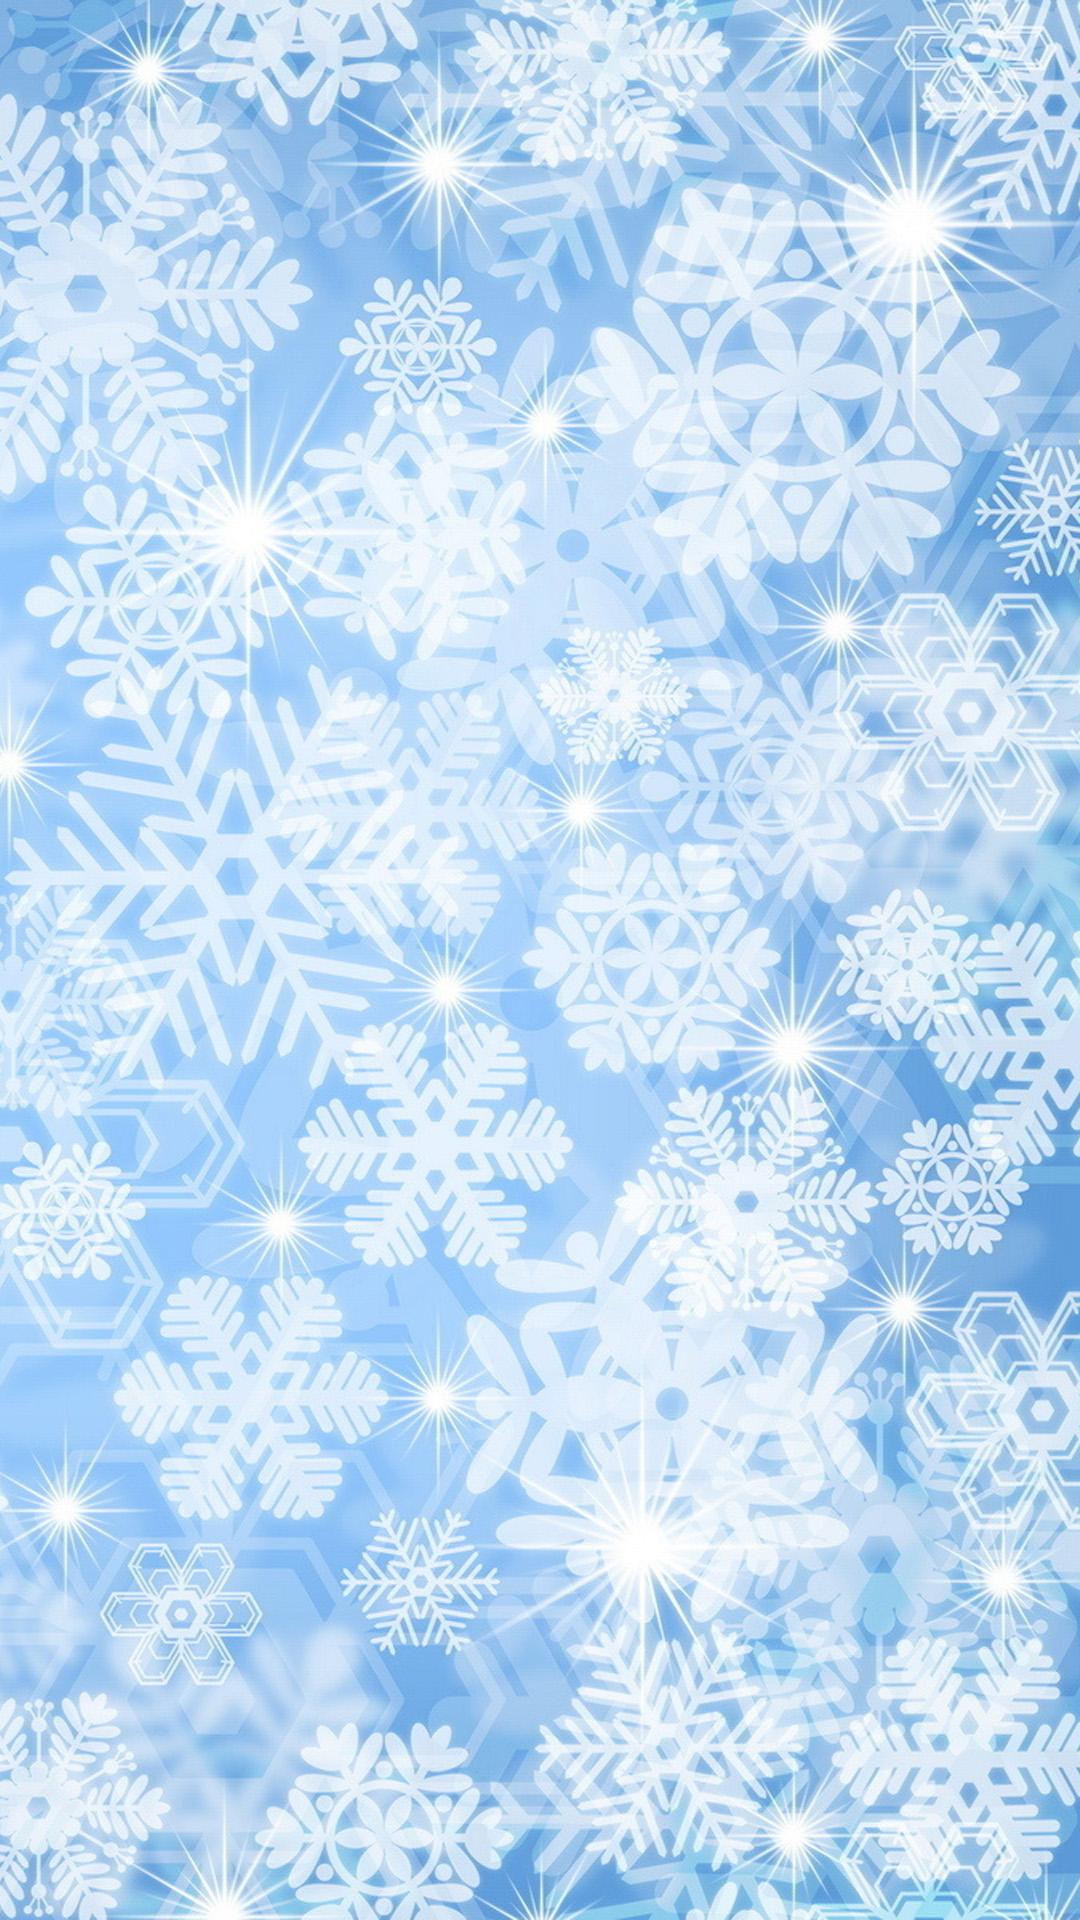 snowflake wallpaper iphone - photo #7